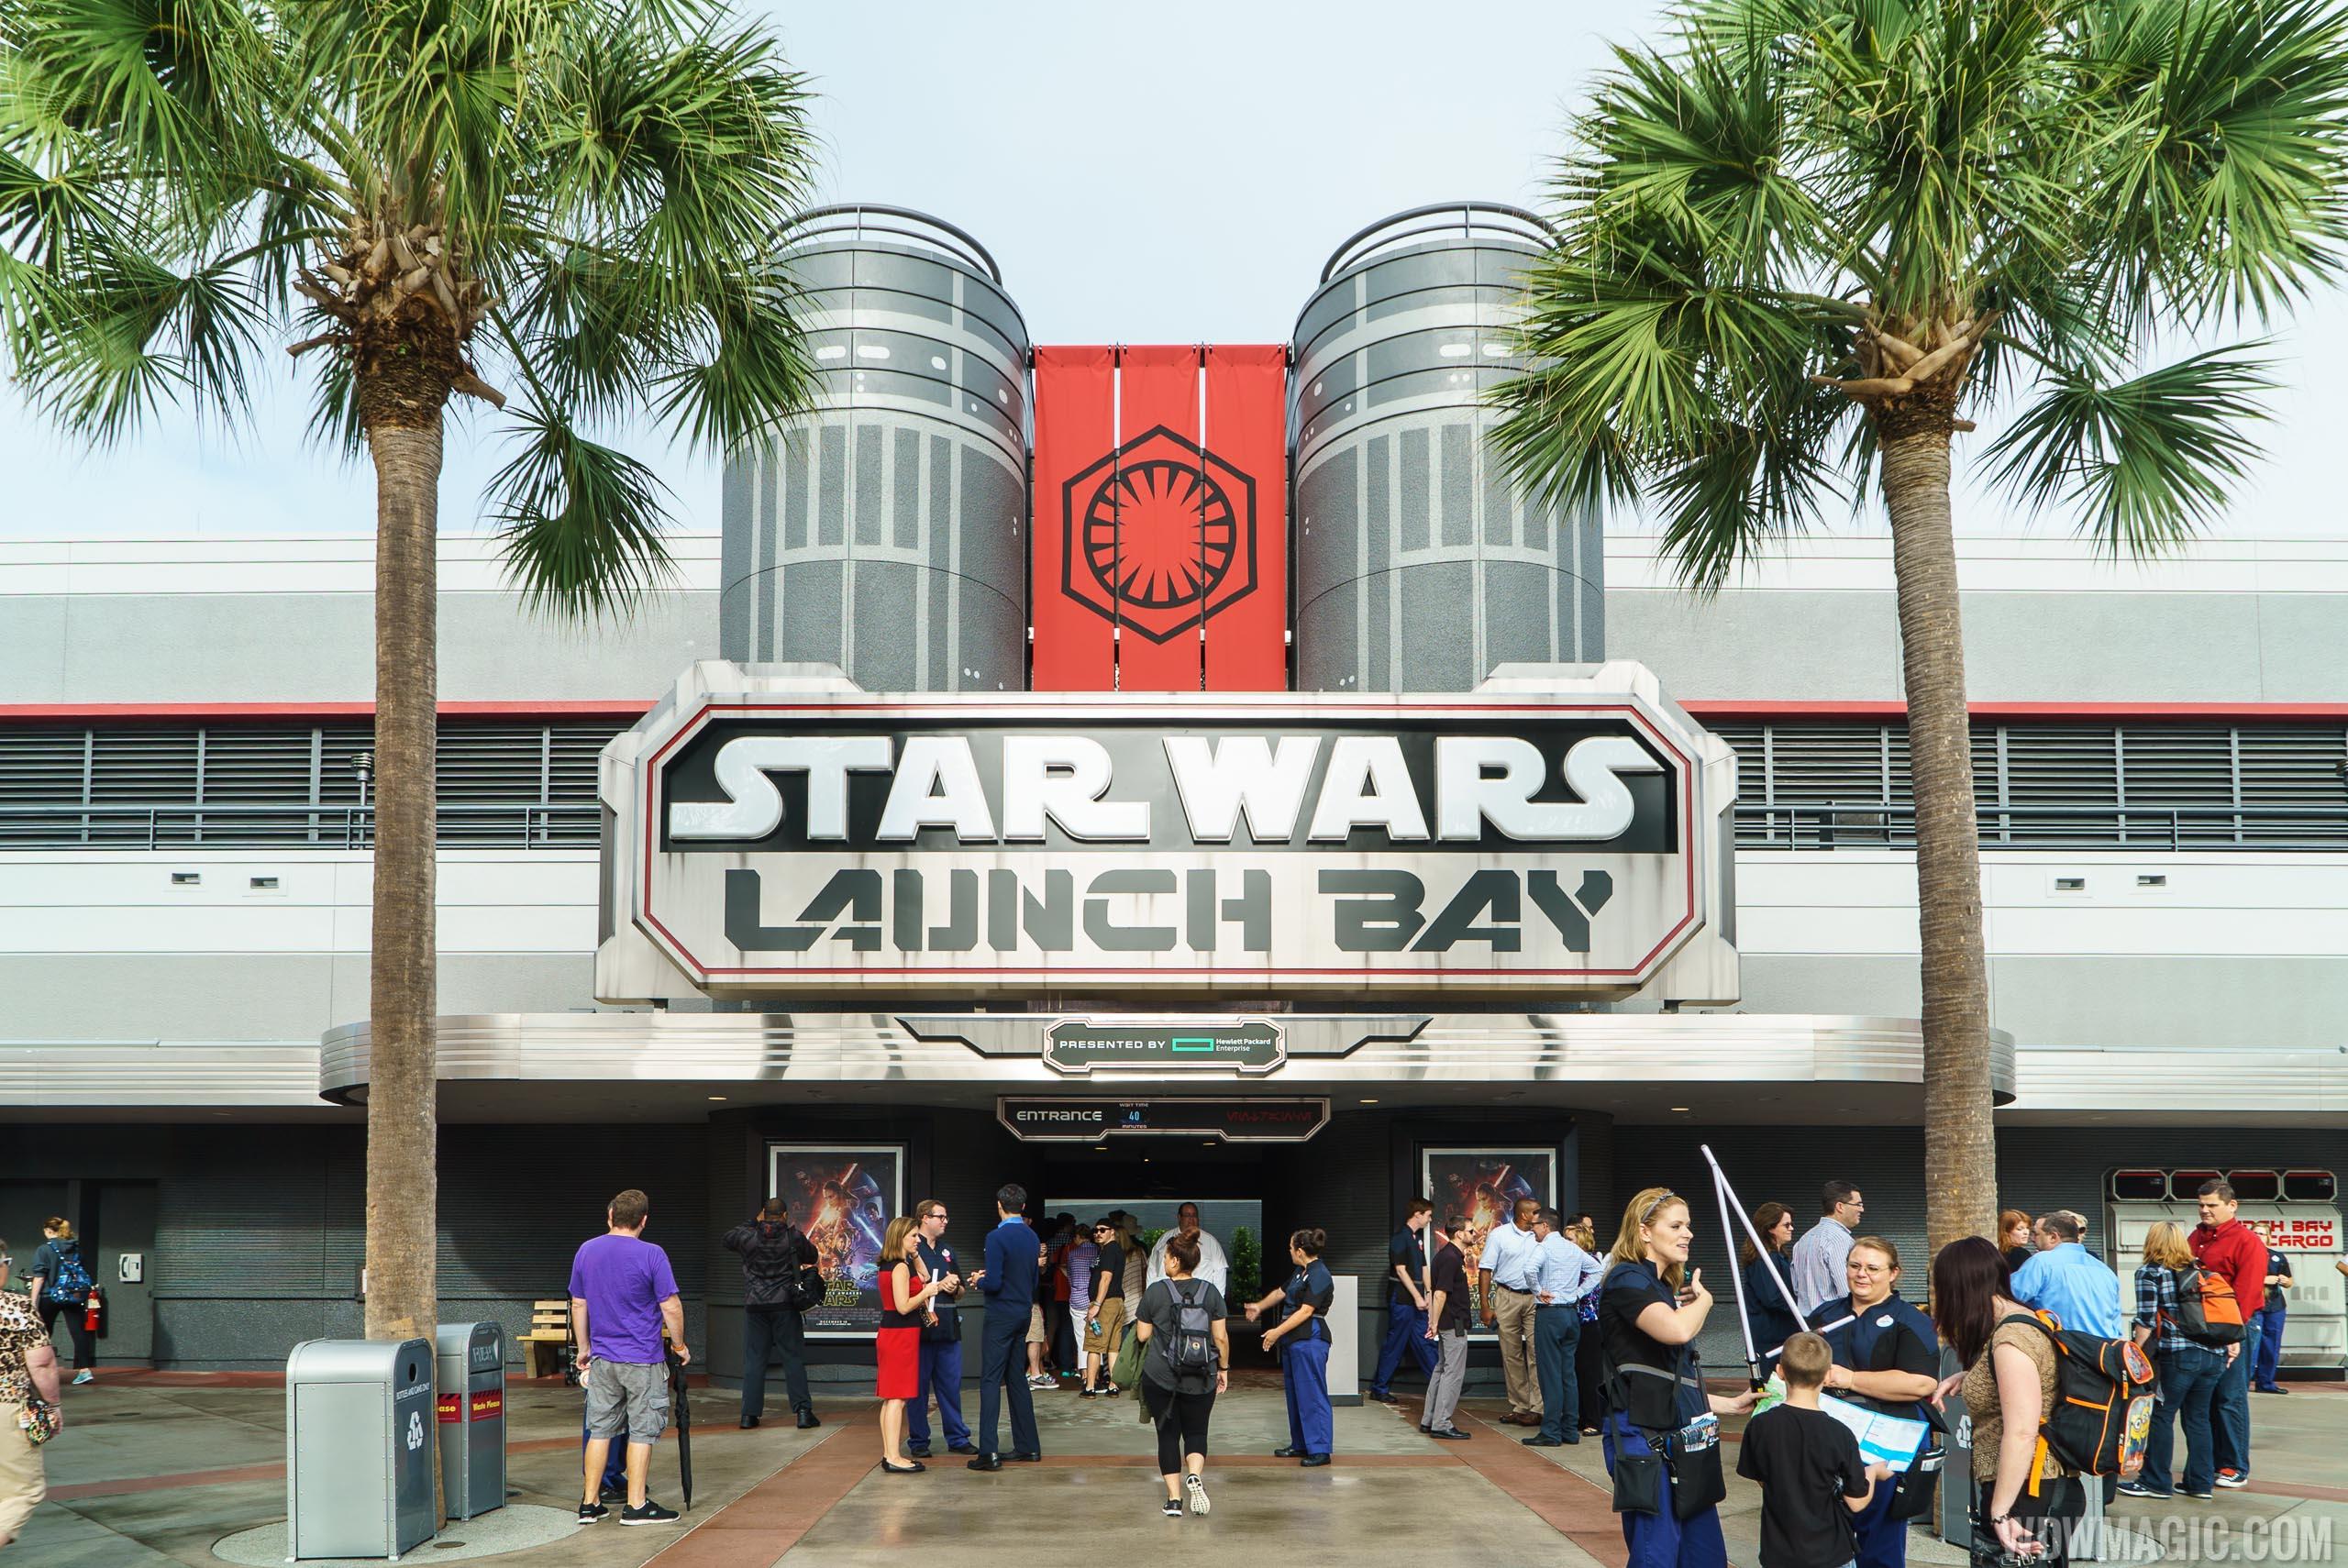 Star Wars Launch Bay - Entrance